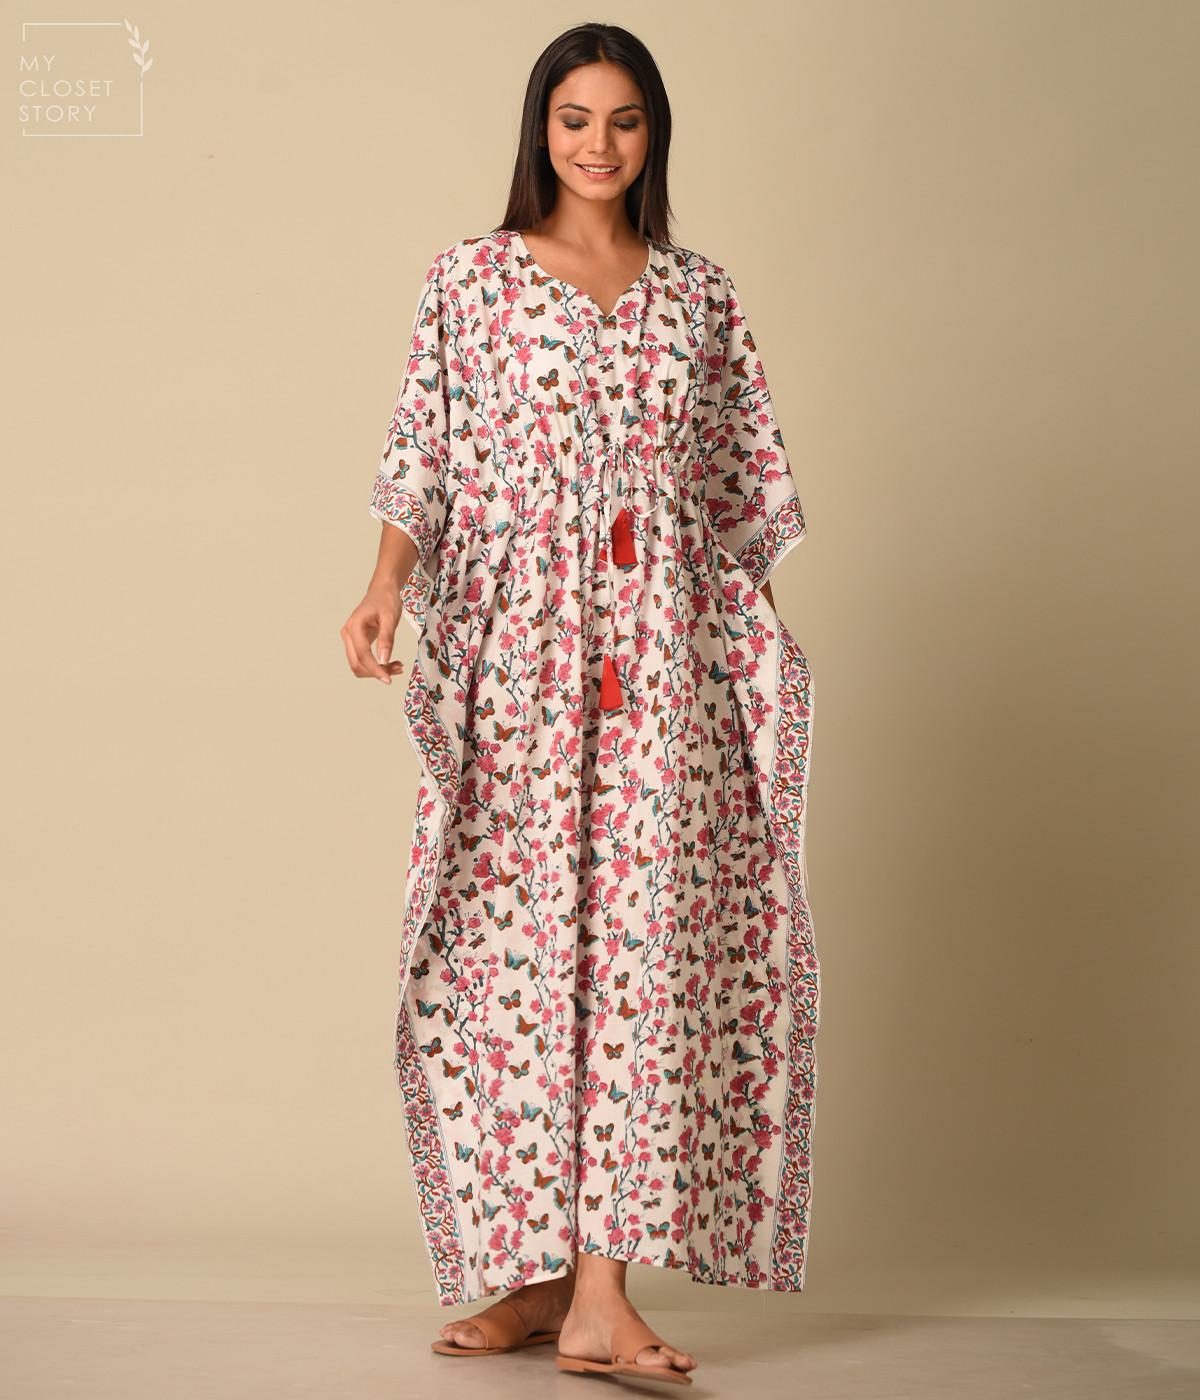 Get Ladies Kaftans Online from MyClosetStory